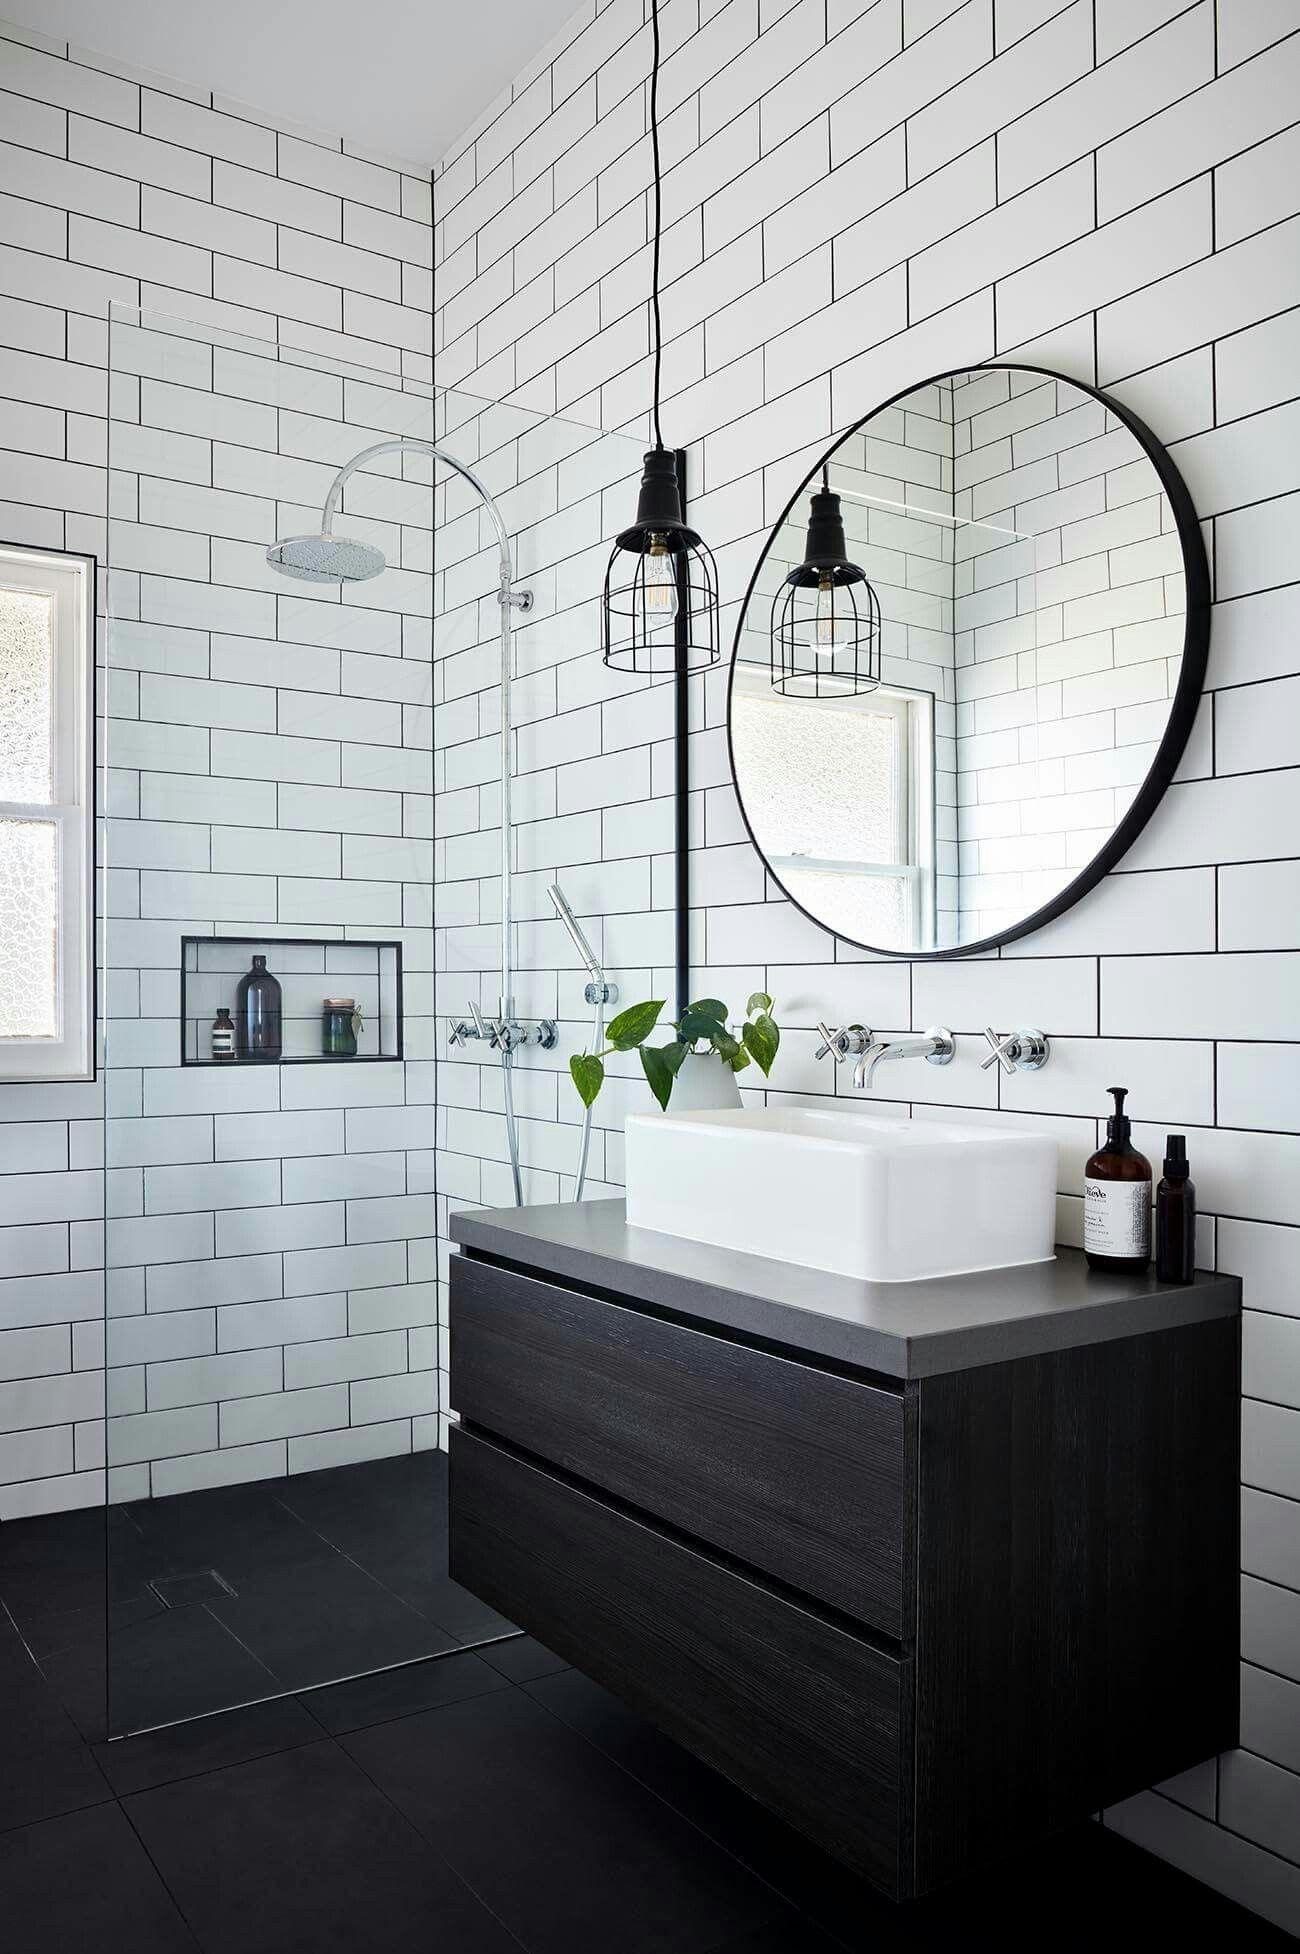 Pinterest Karenbjarna Dusche Umgestalten Badezimmer Innenausstattung Badezimmer Grundriss